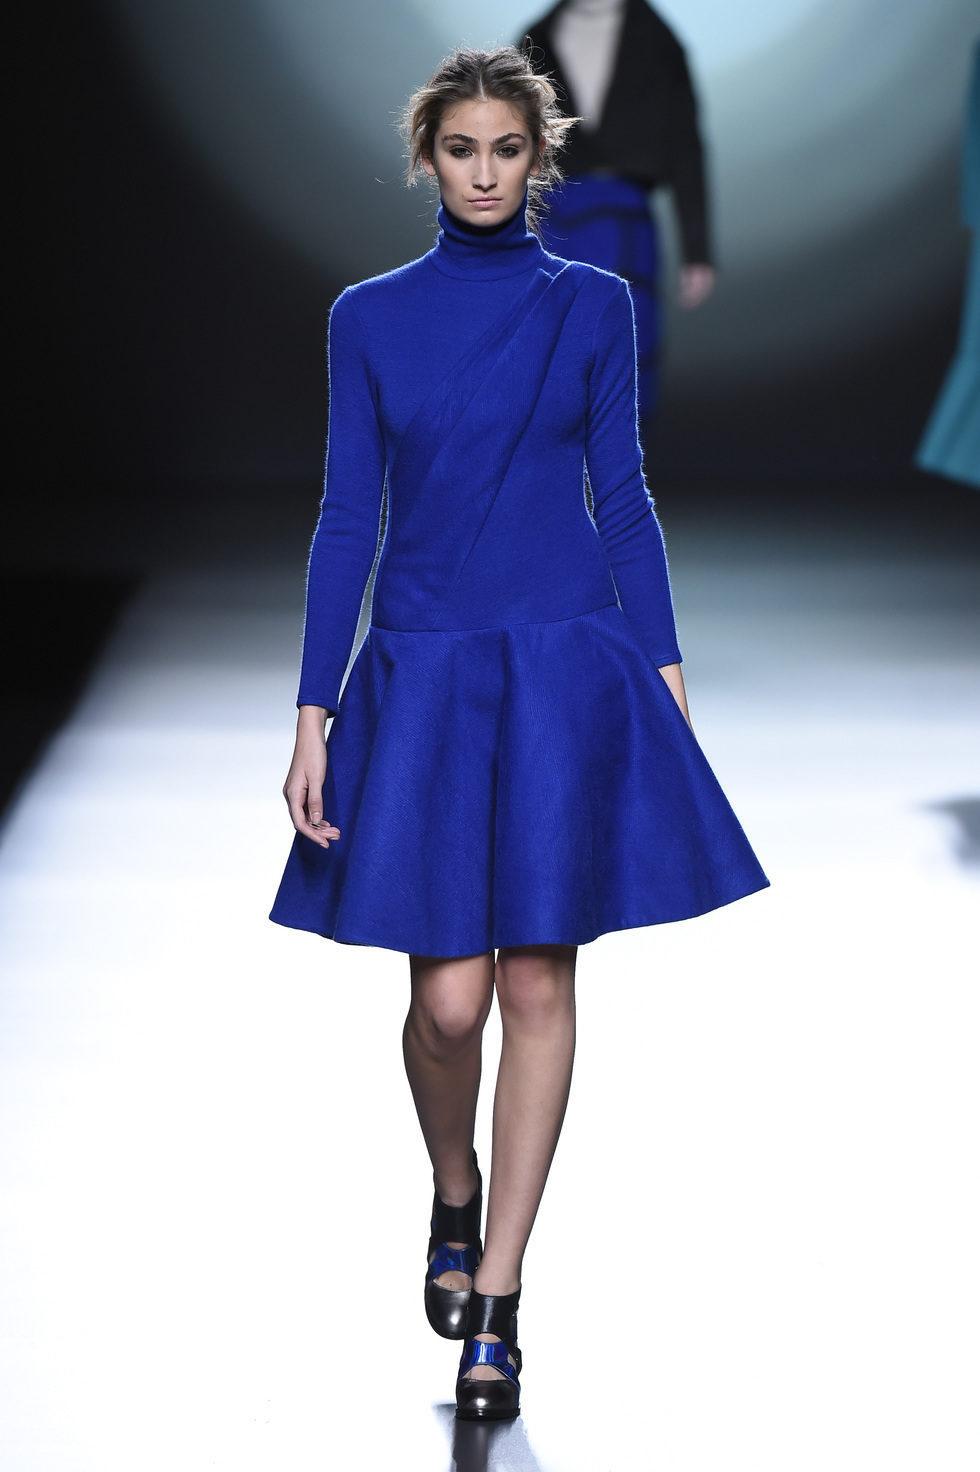 70821_vestido-azul-zafiro-coleccion-otono-invierno-2015-2016-amaya-arzuaga-madrid-fashion-week